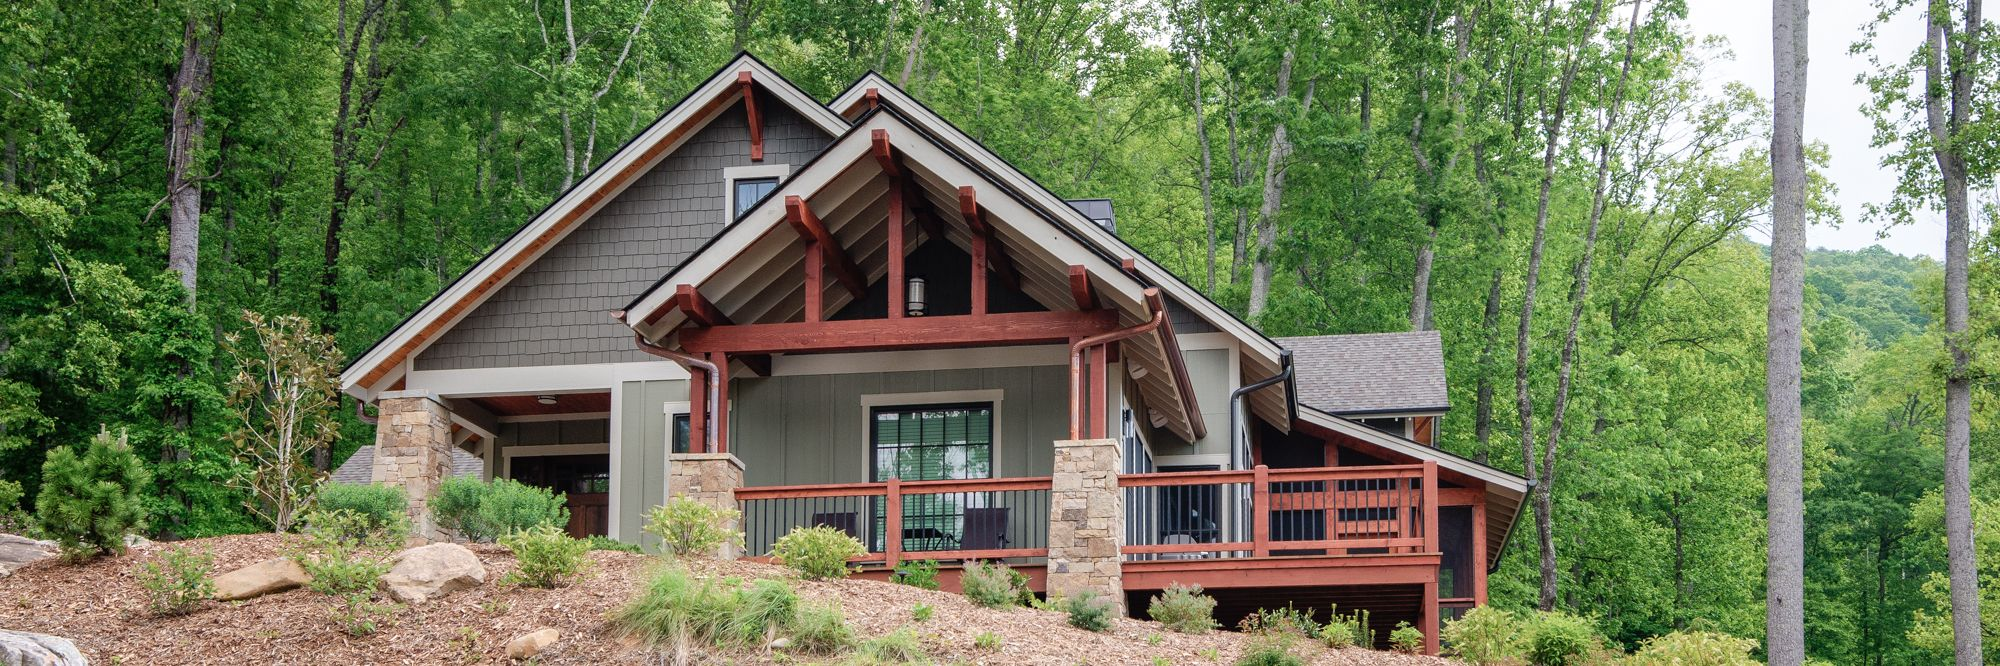 Pre designed plans living stone design build for Blueprints for homes already built